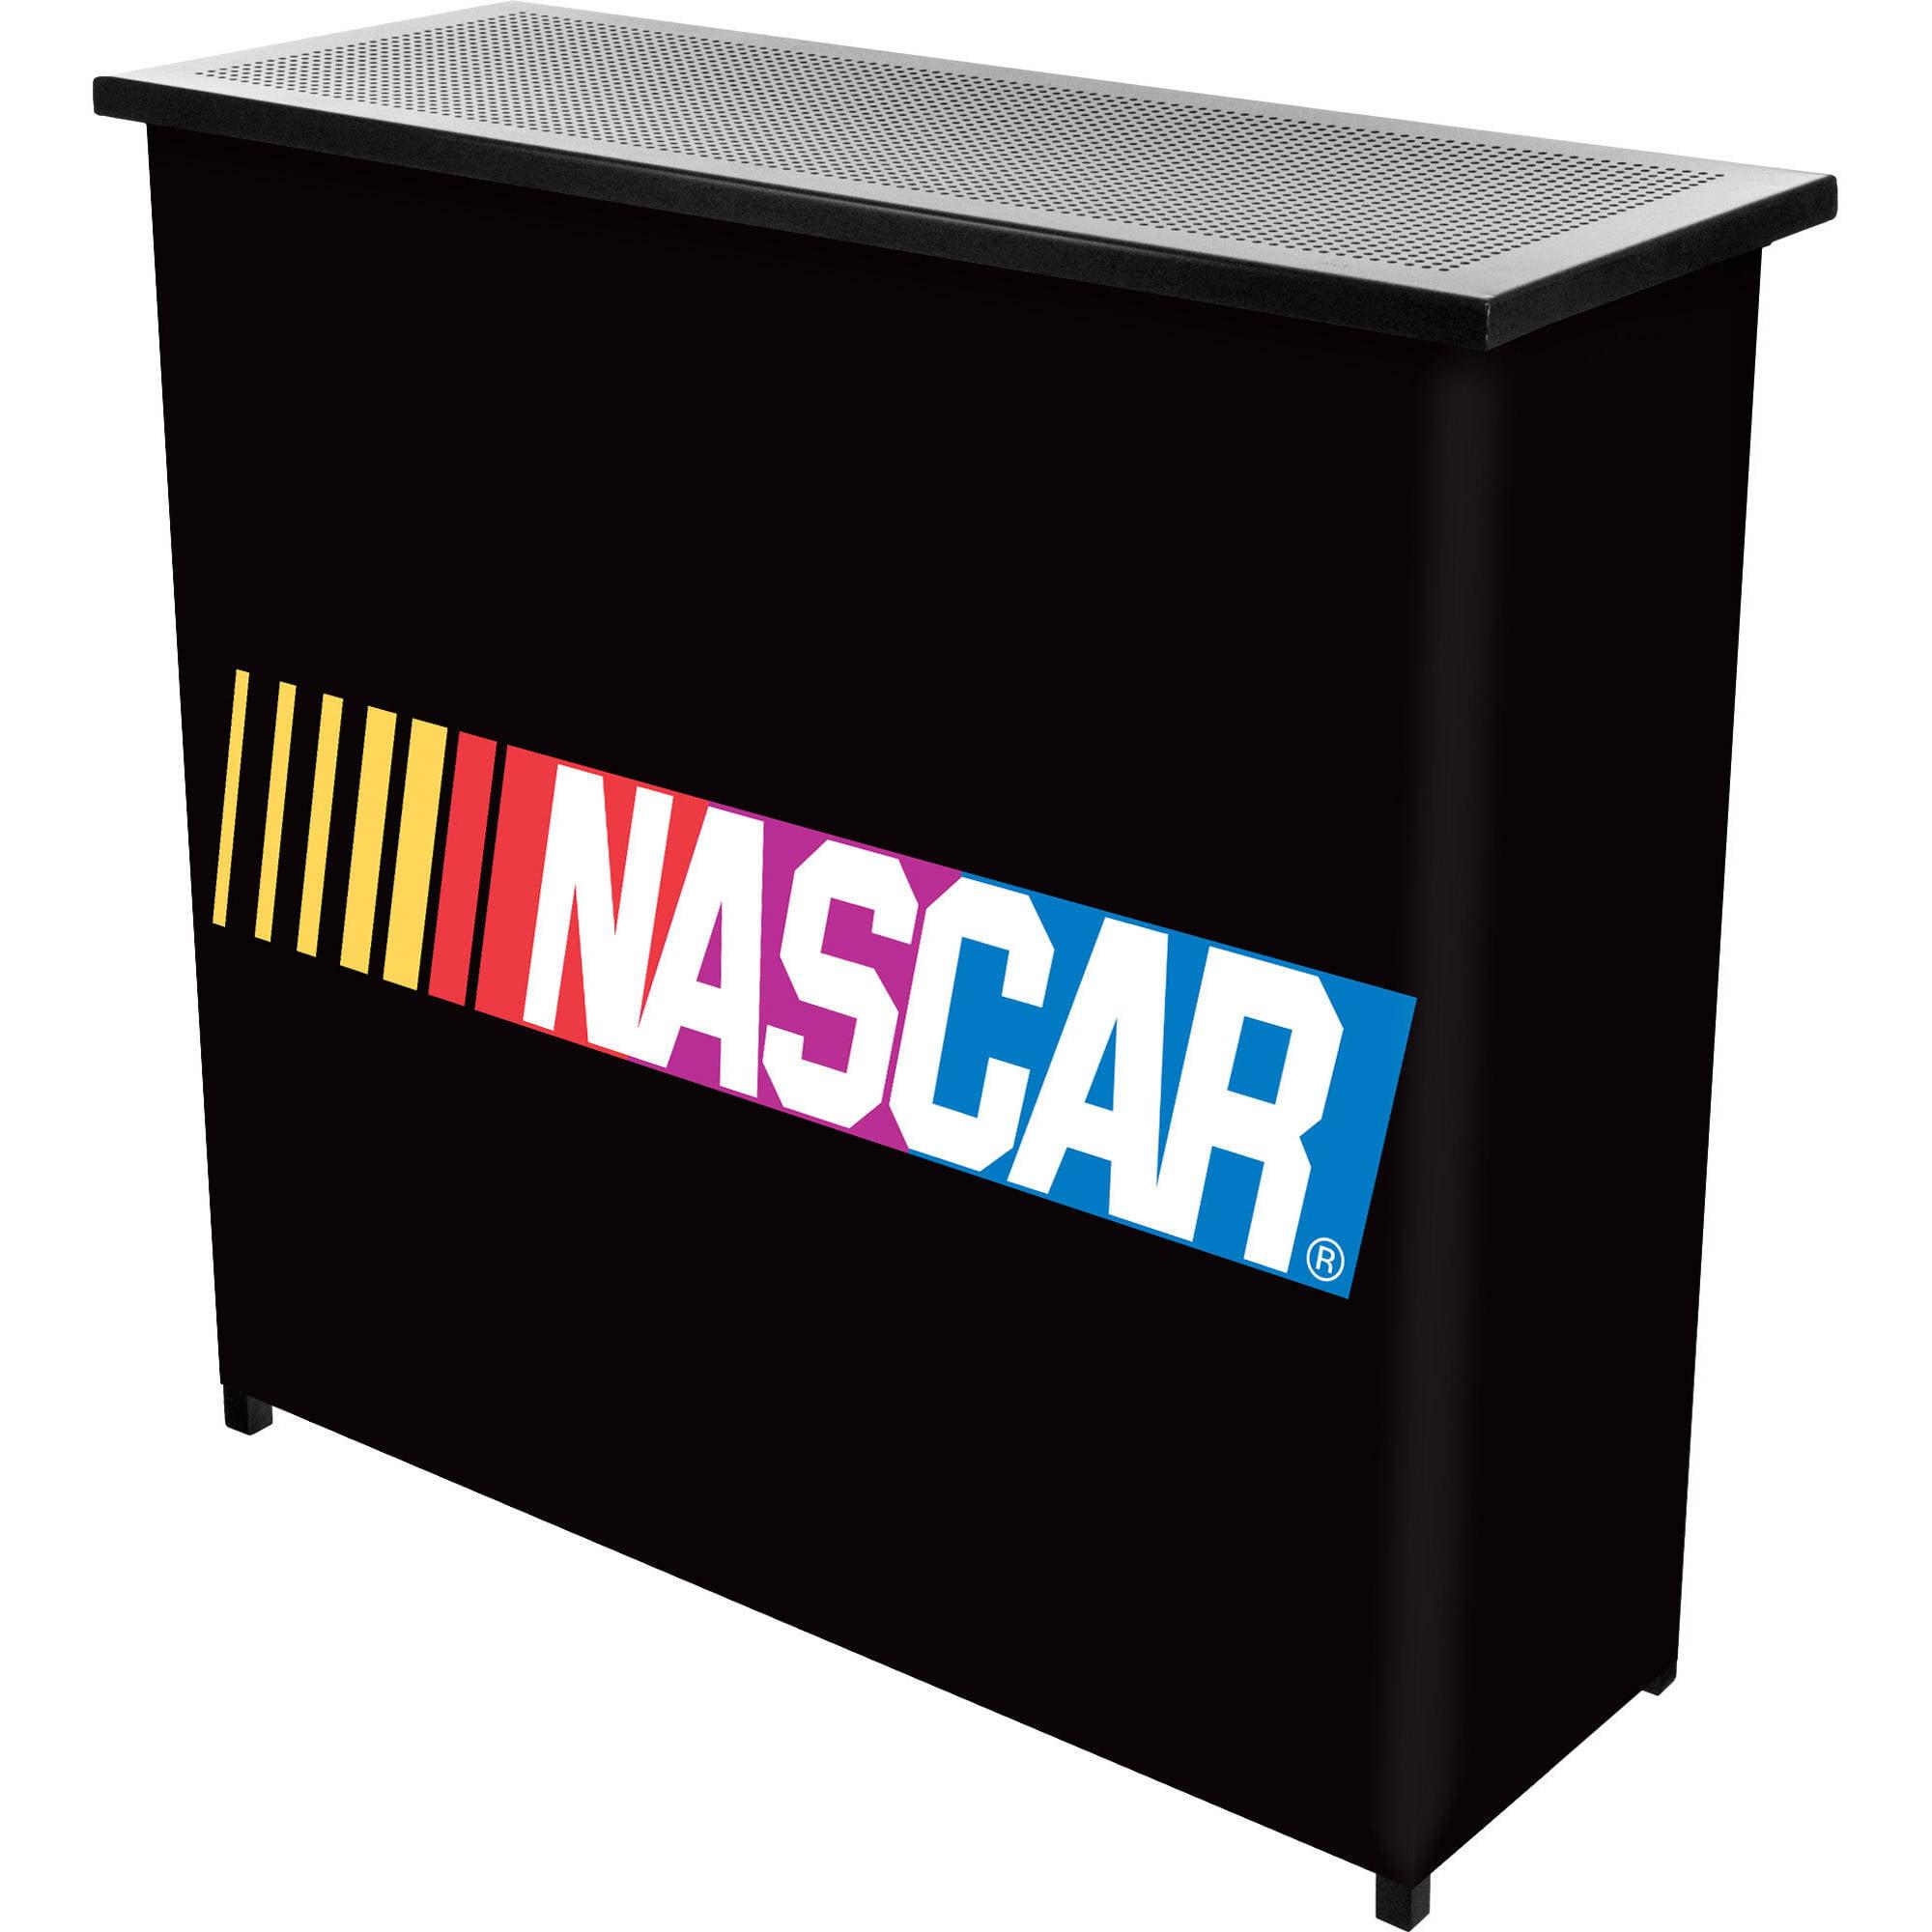 NASCAR 2-Shelf Portable Bar with Carrying Case